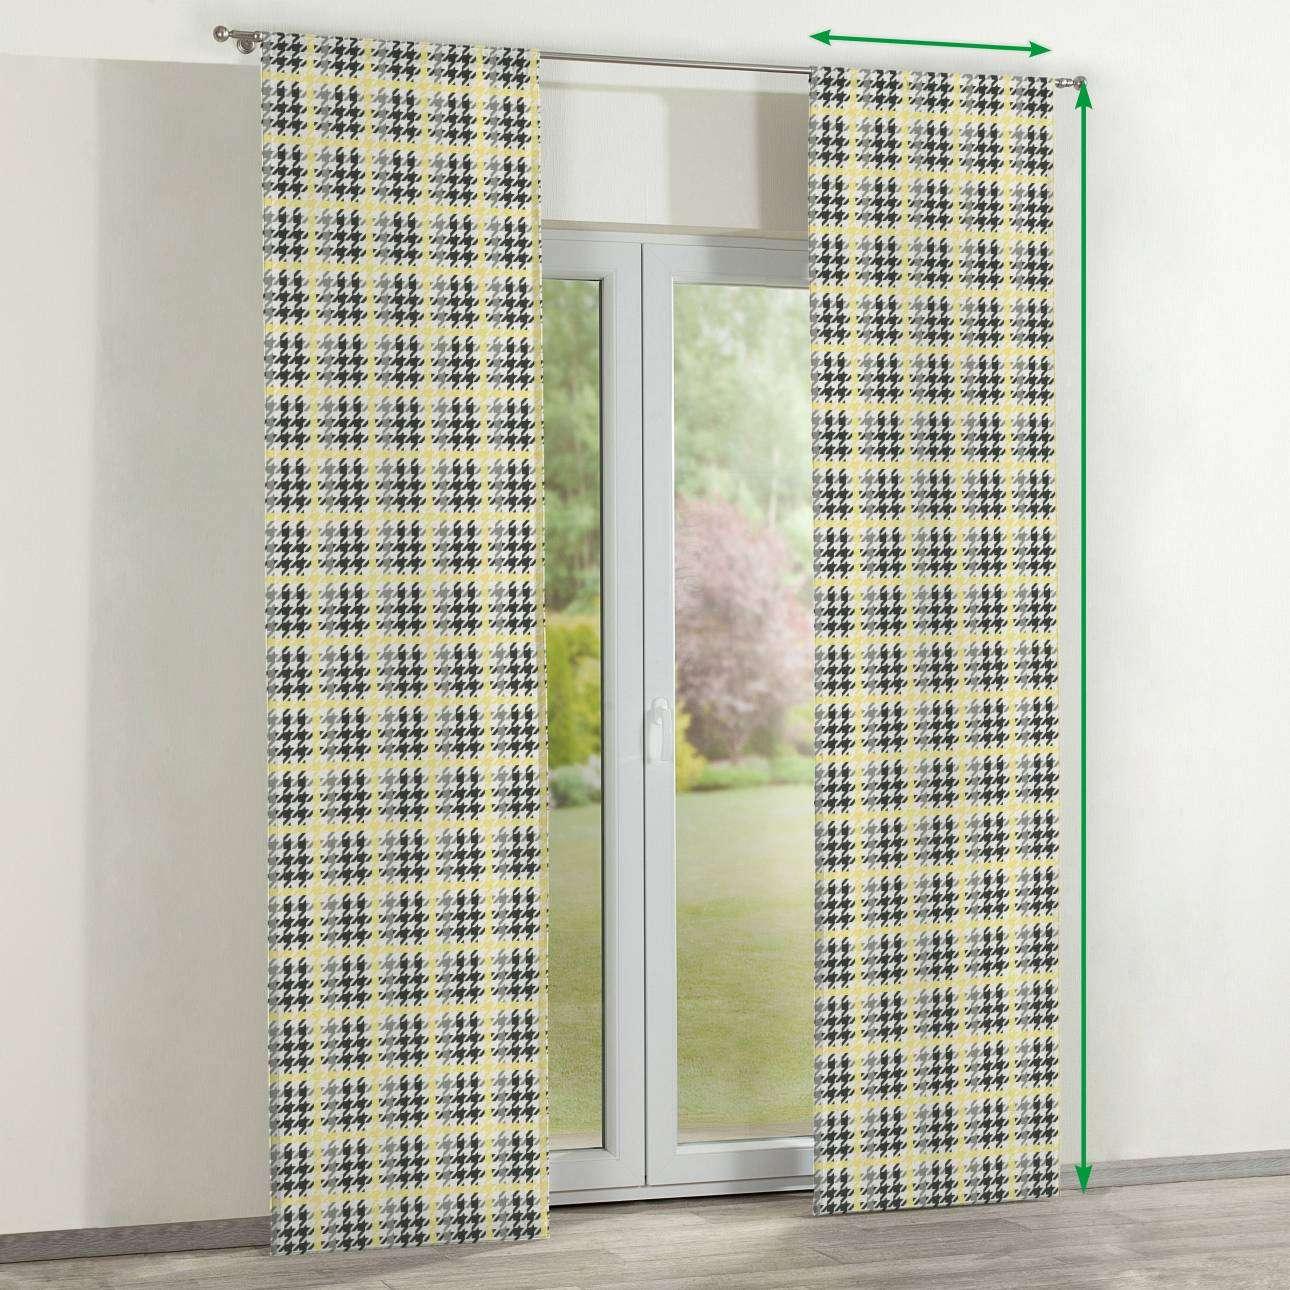 Panelové závesy 2 ks V kolekcii Brooklyn, tkanina: 137-79